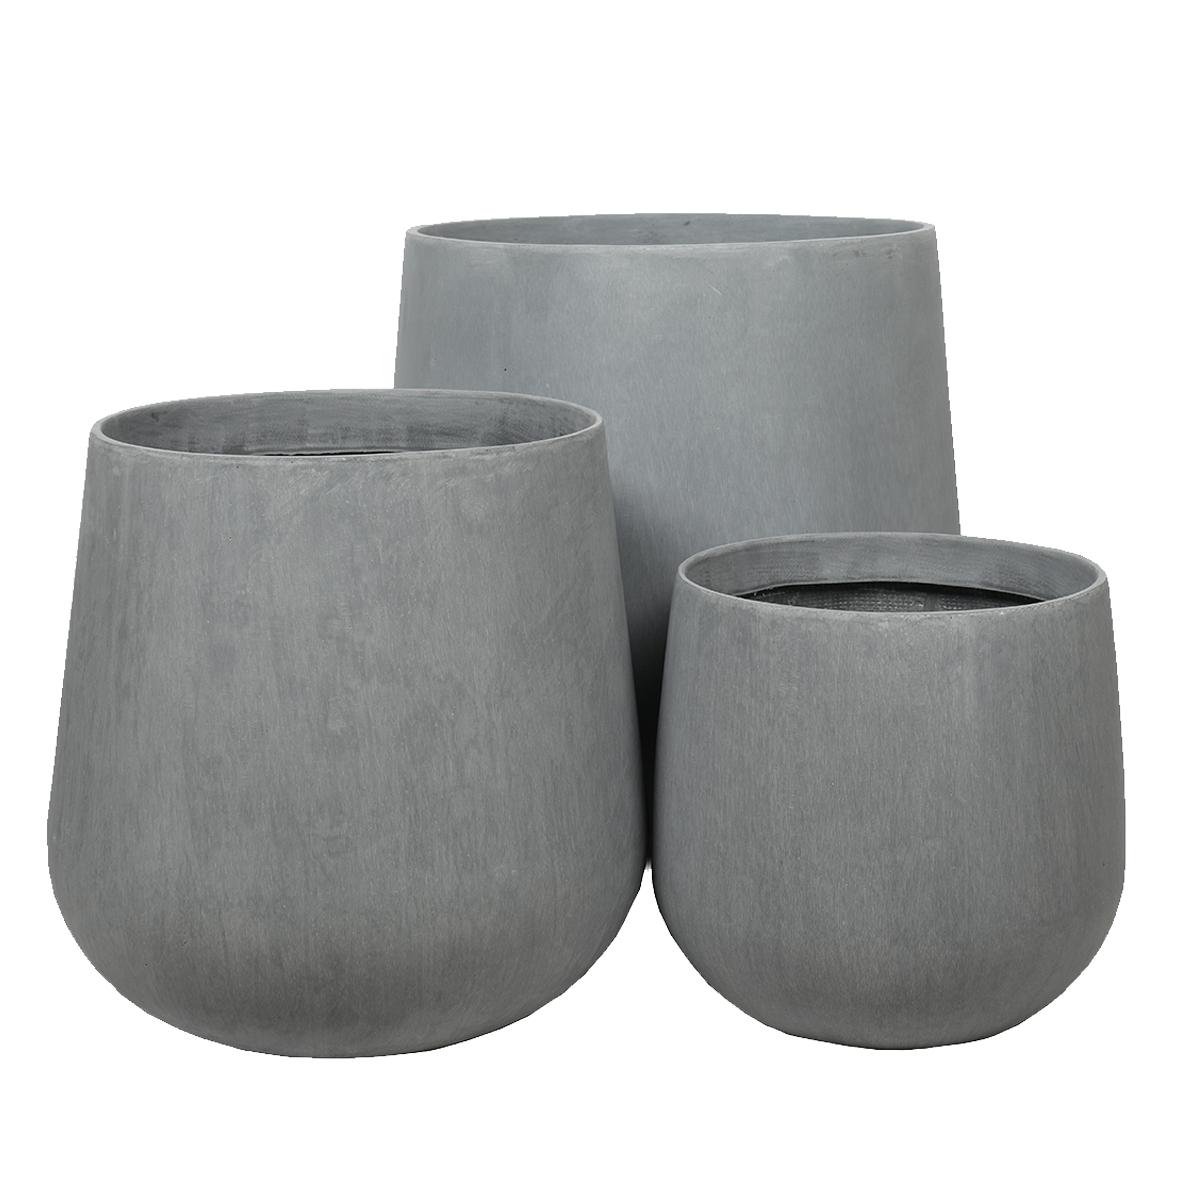 Paunch Pot Planter Cement Grey Collection